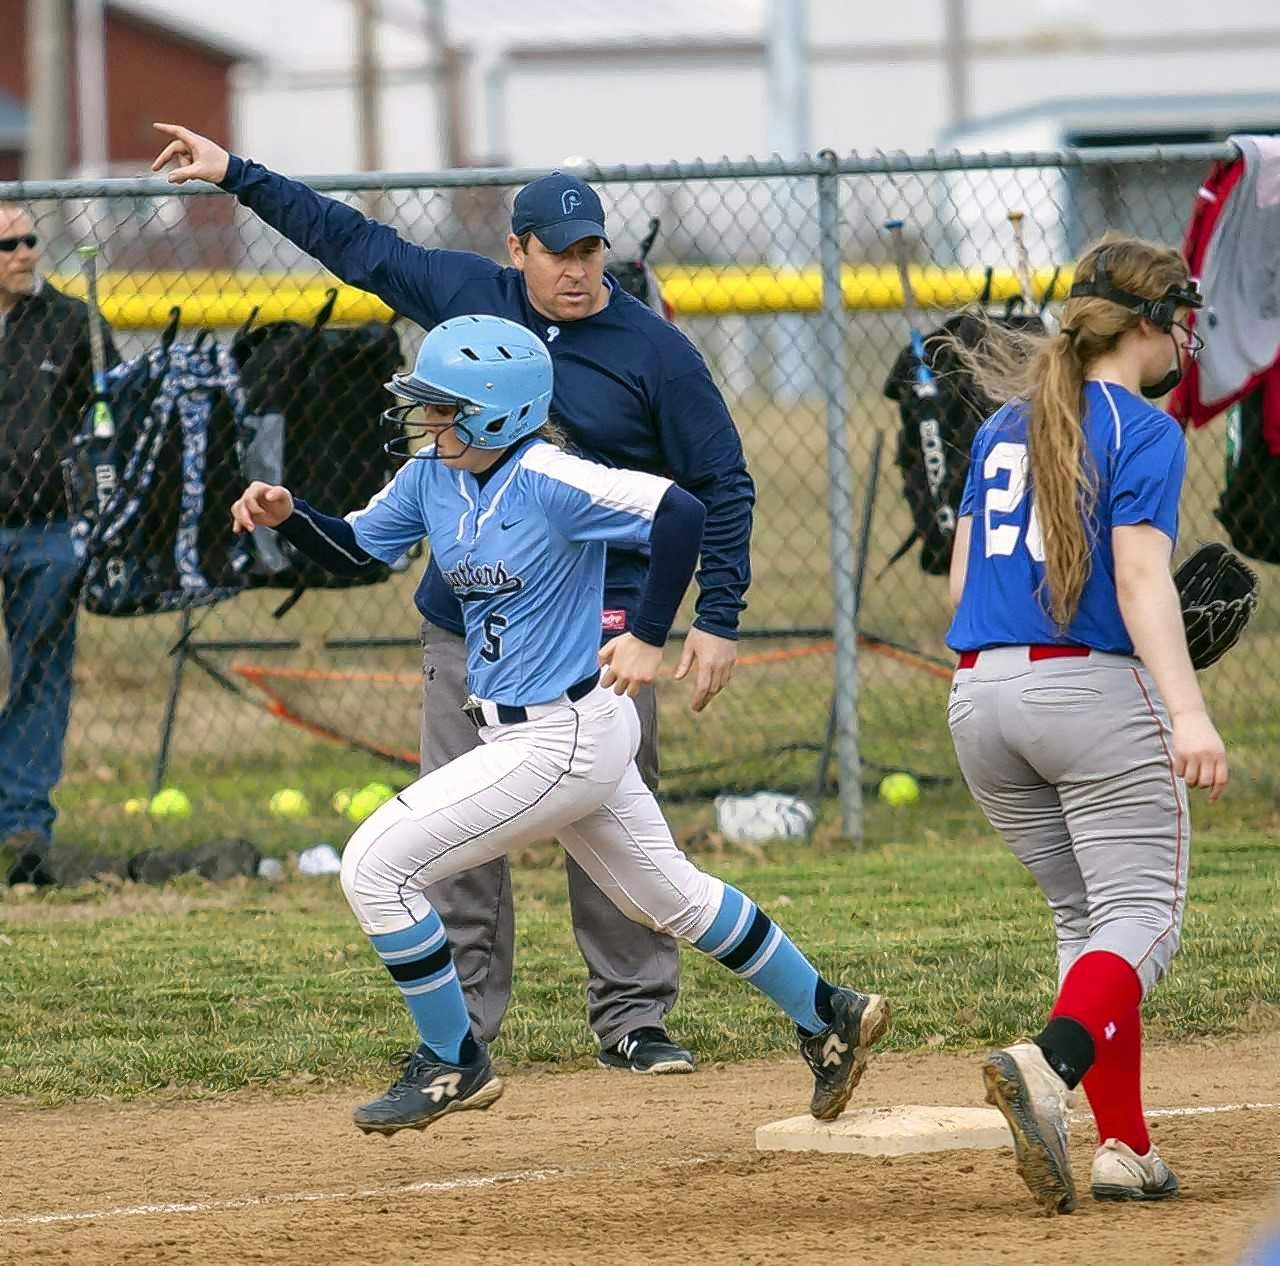 PCHS softball coach Alan Engelhardt sends runner Lynlee Lindner home for a run.